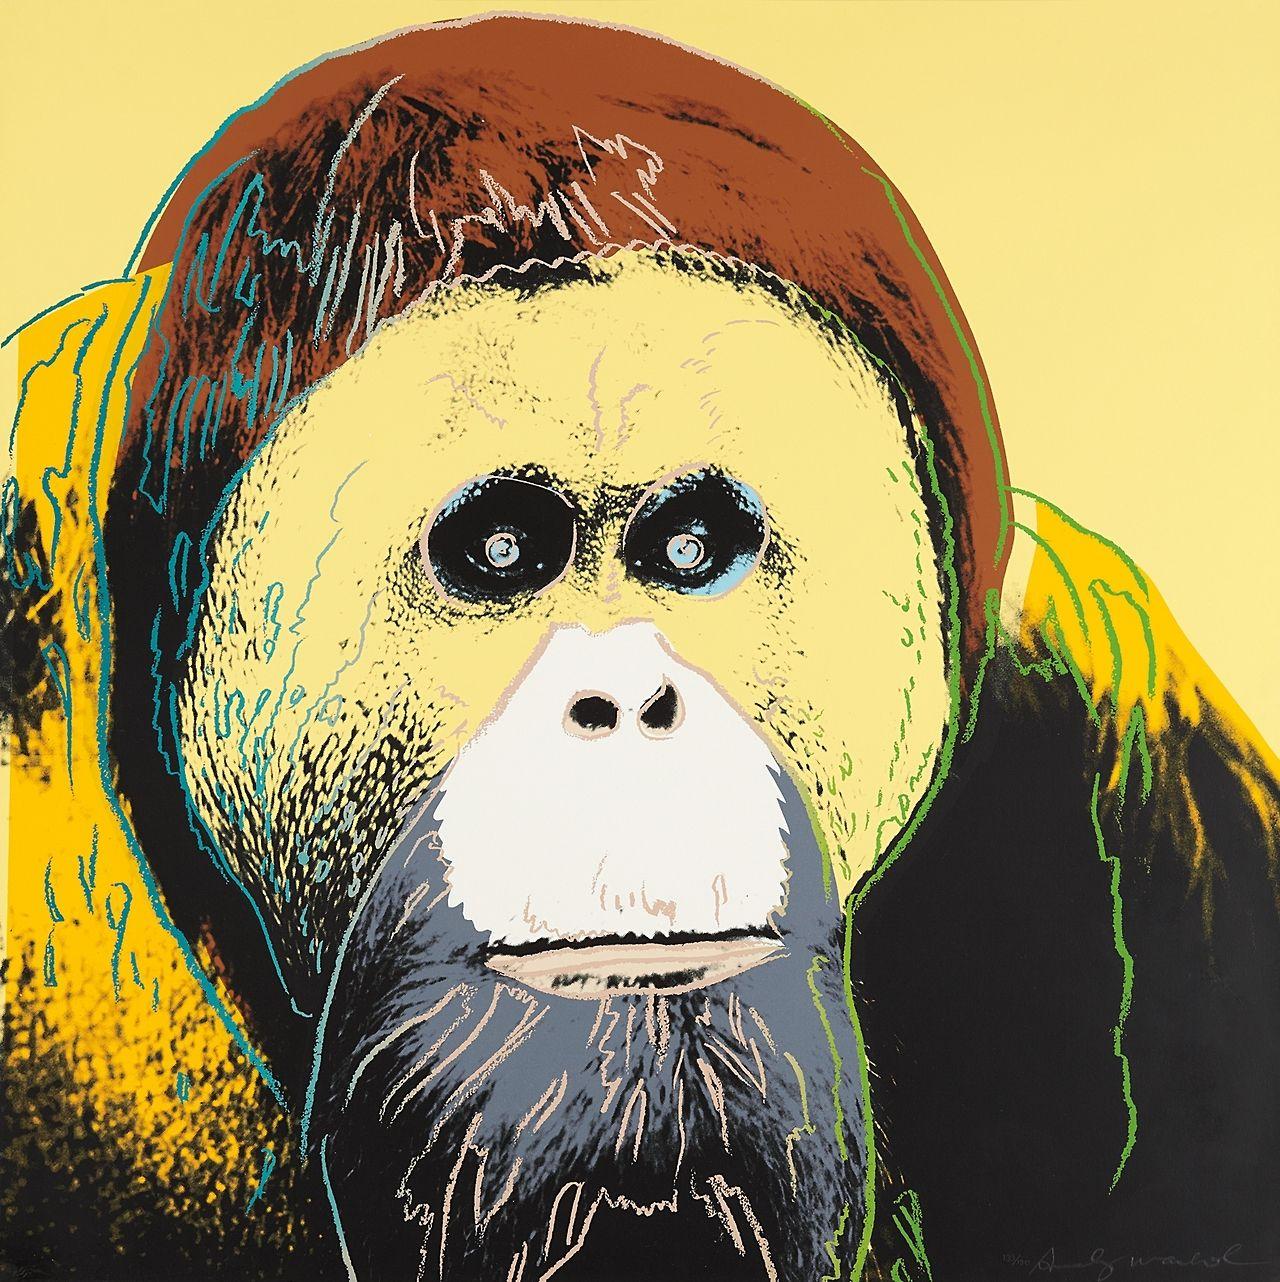 ANDY WARHOL (1928-1987) - Orangutan, from Endangered Species, 1983